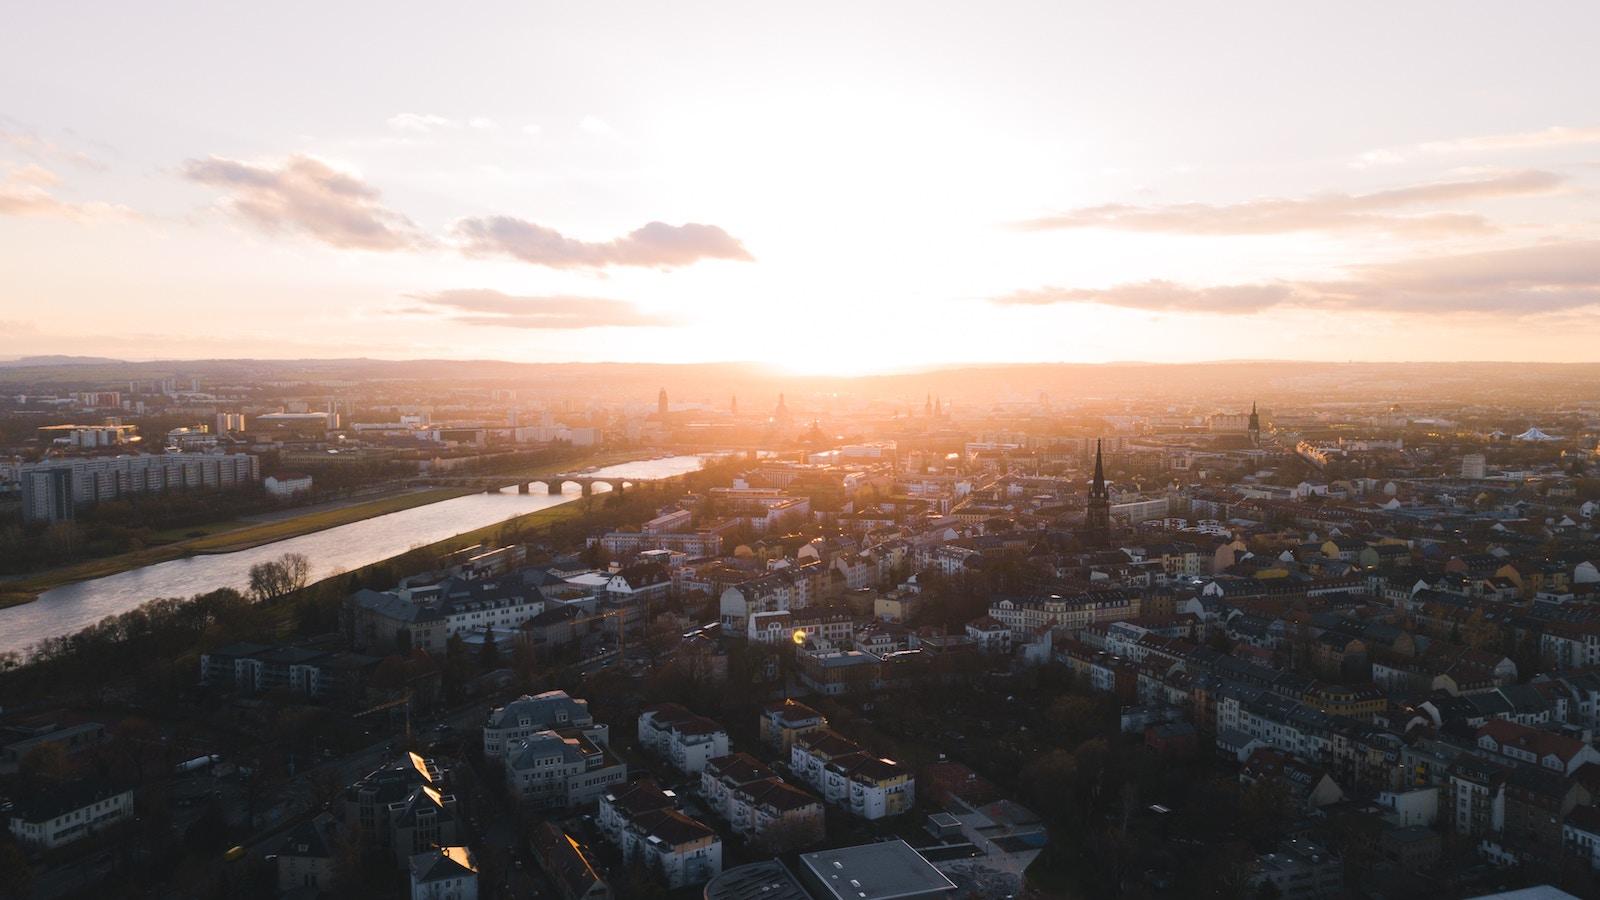 Kurierdienst Dresden